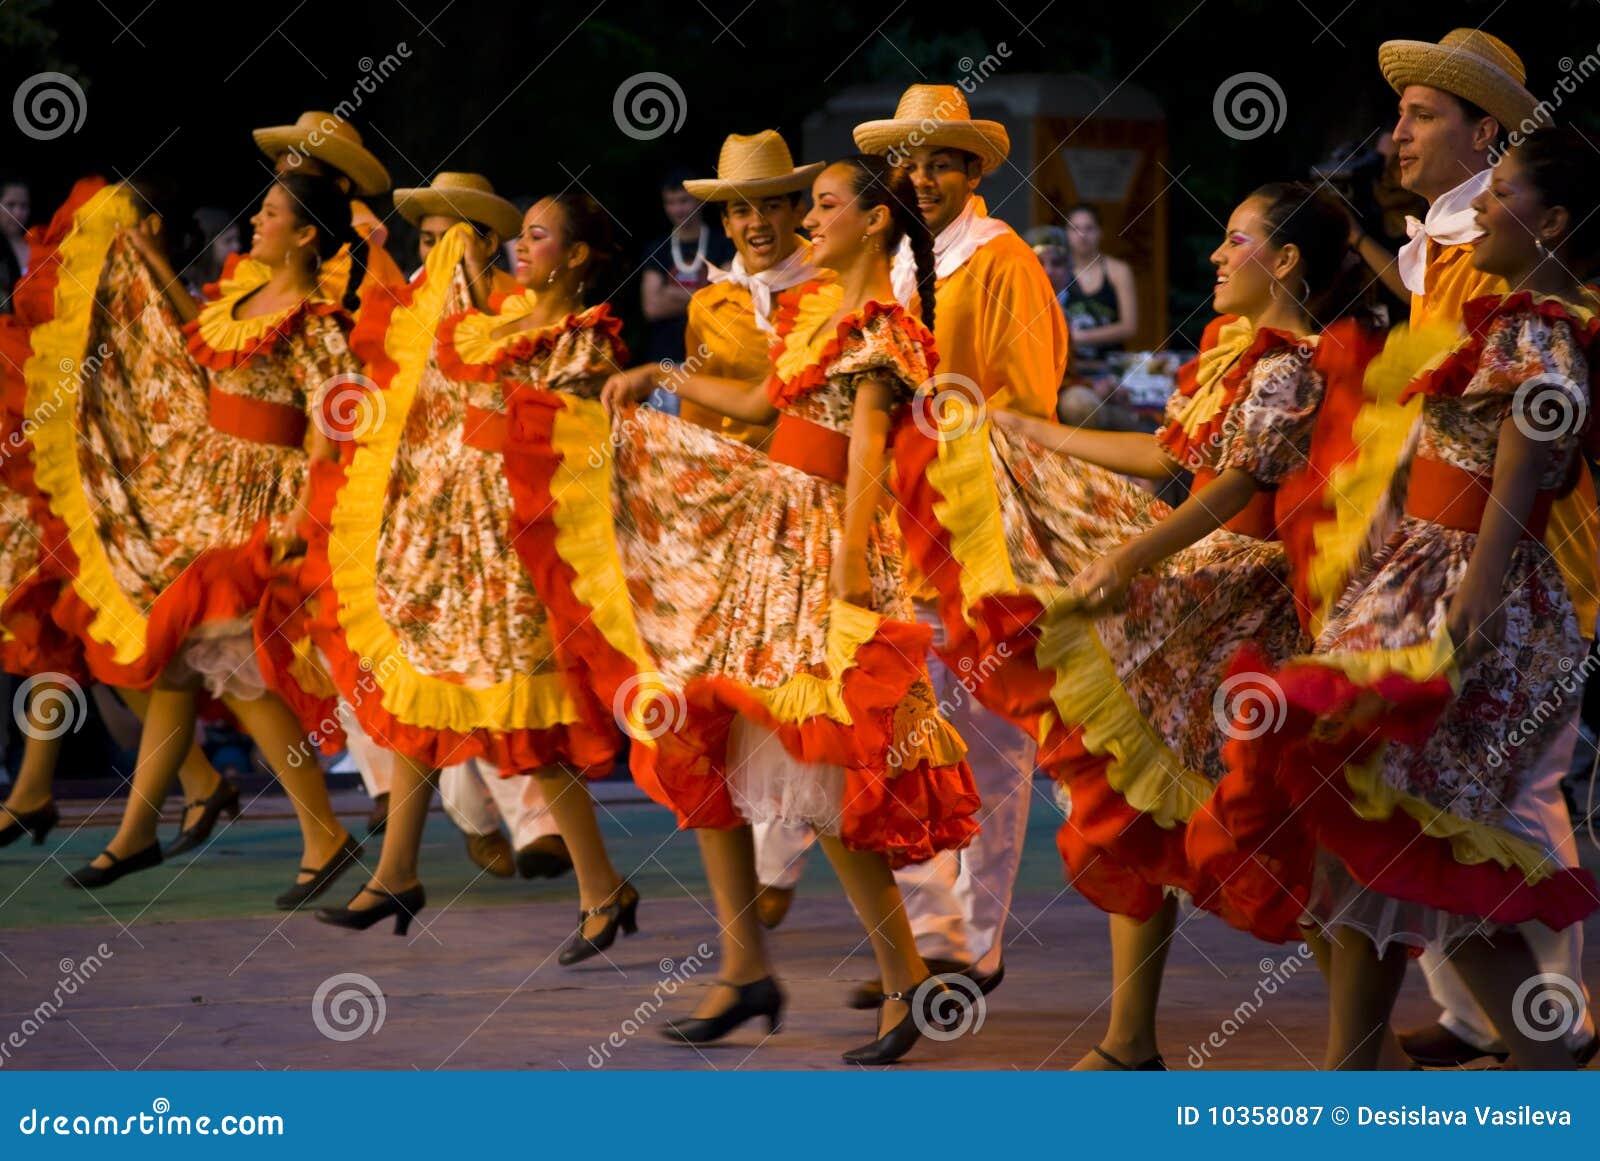 Brazil dances editorial photography  Image of black, female